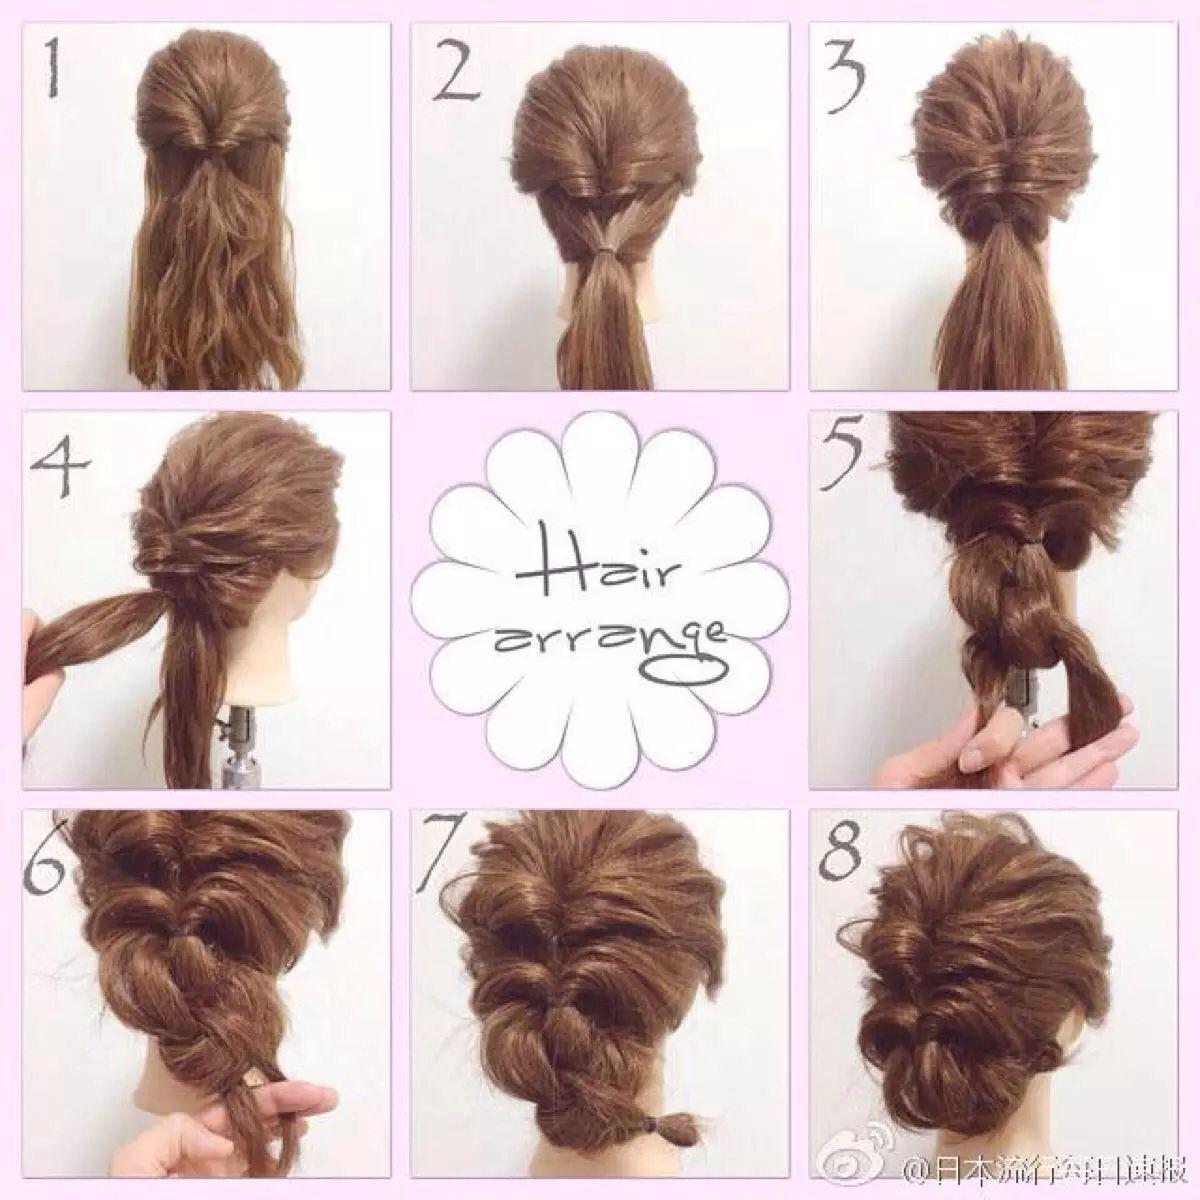 Wedding Inspiration // Hair | Wedding Hair - The Search | Pinterest ...